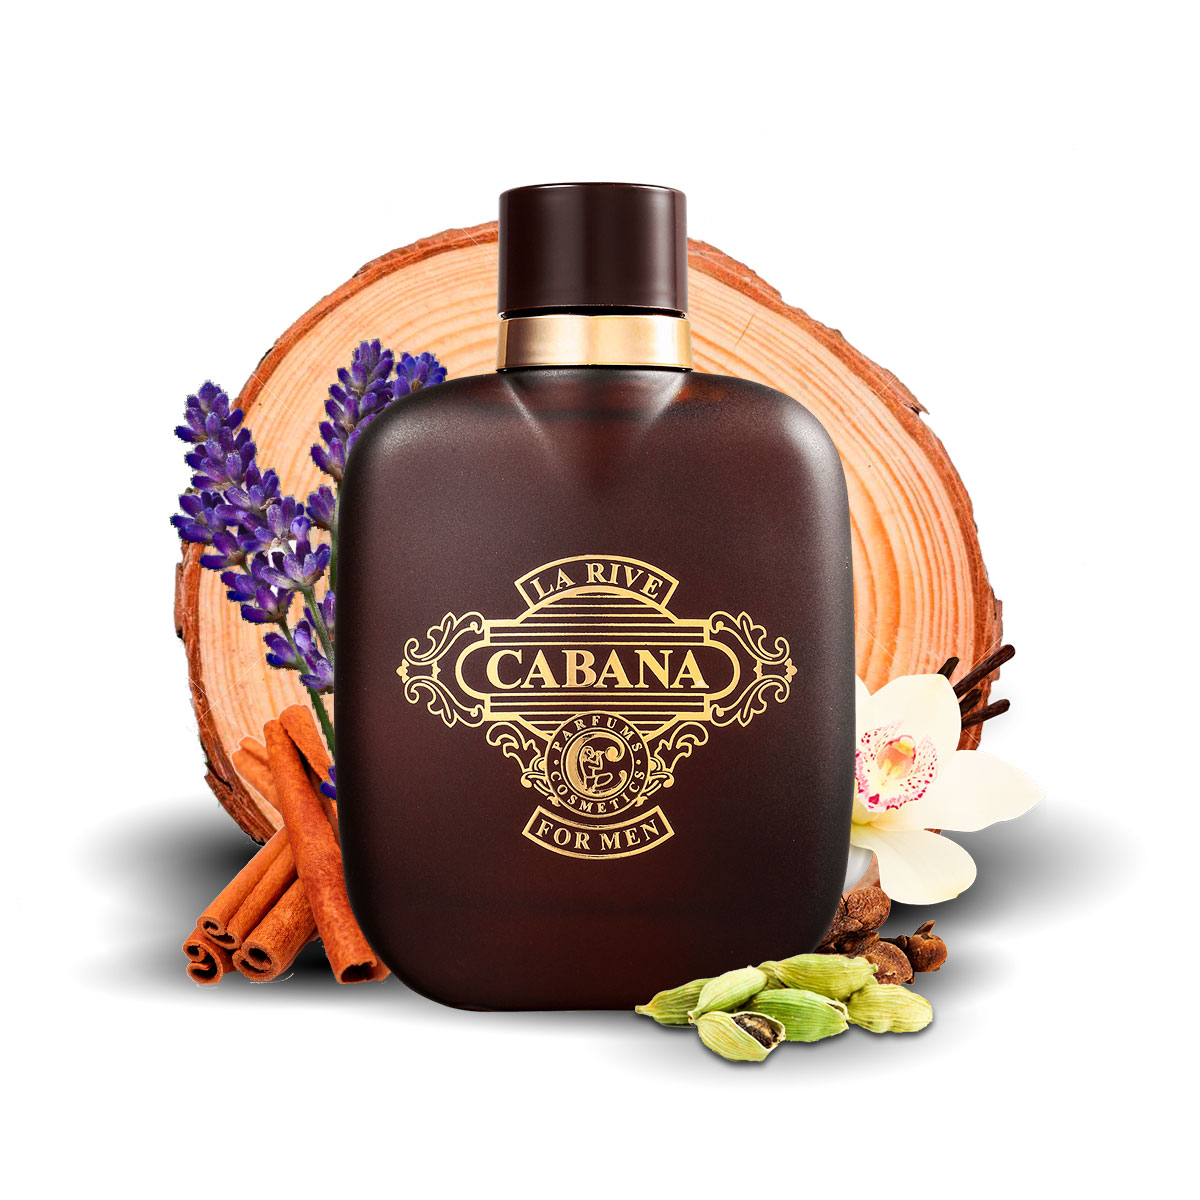 Kit 2 Perfumes Importados Cabana e Body Like a Man La Rive